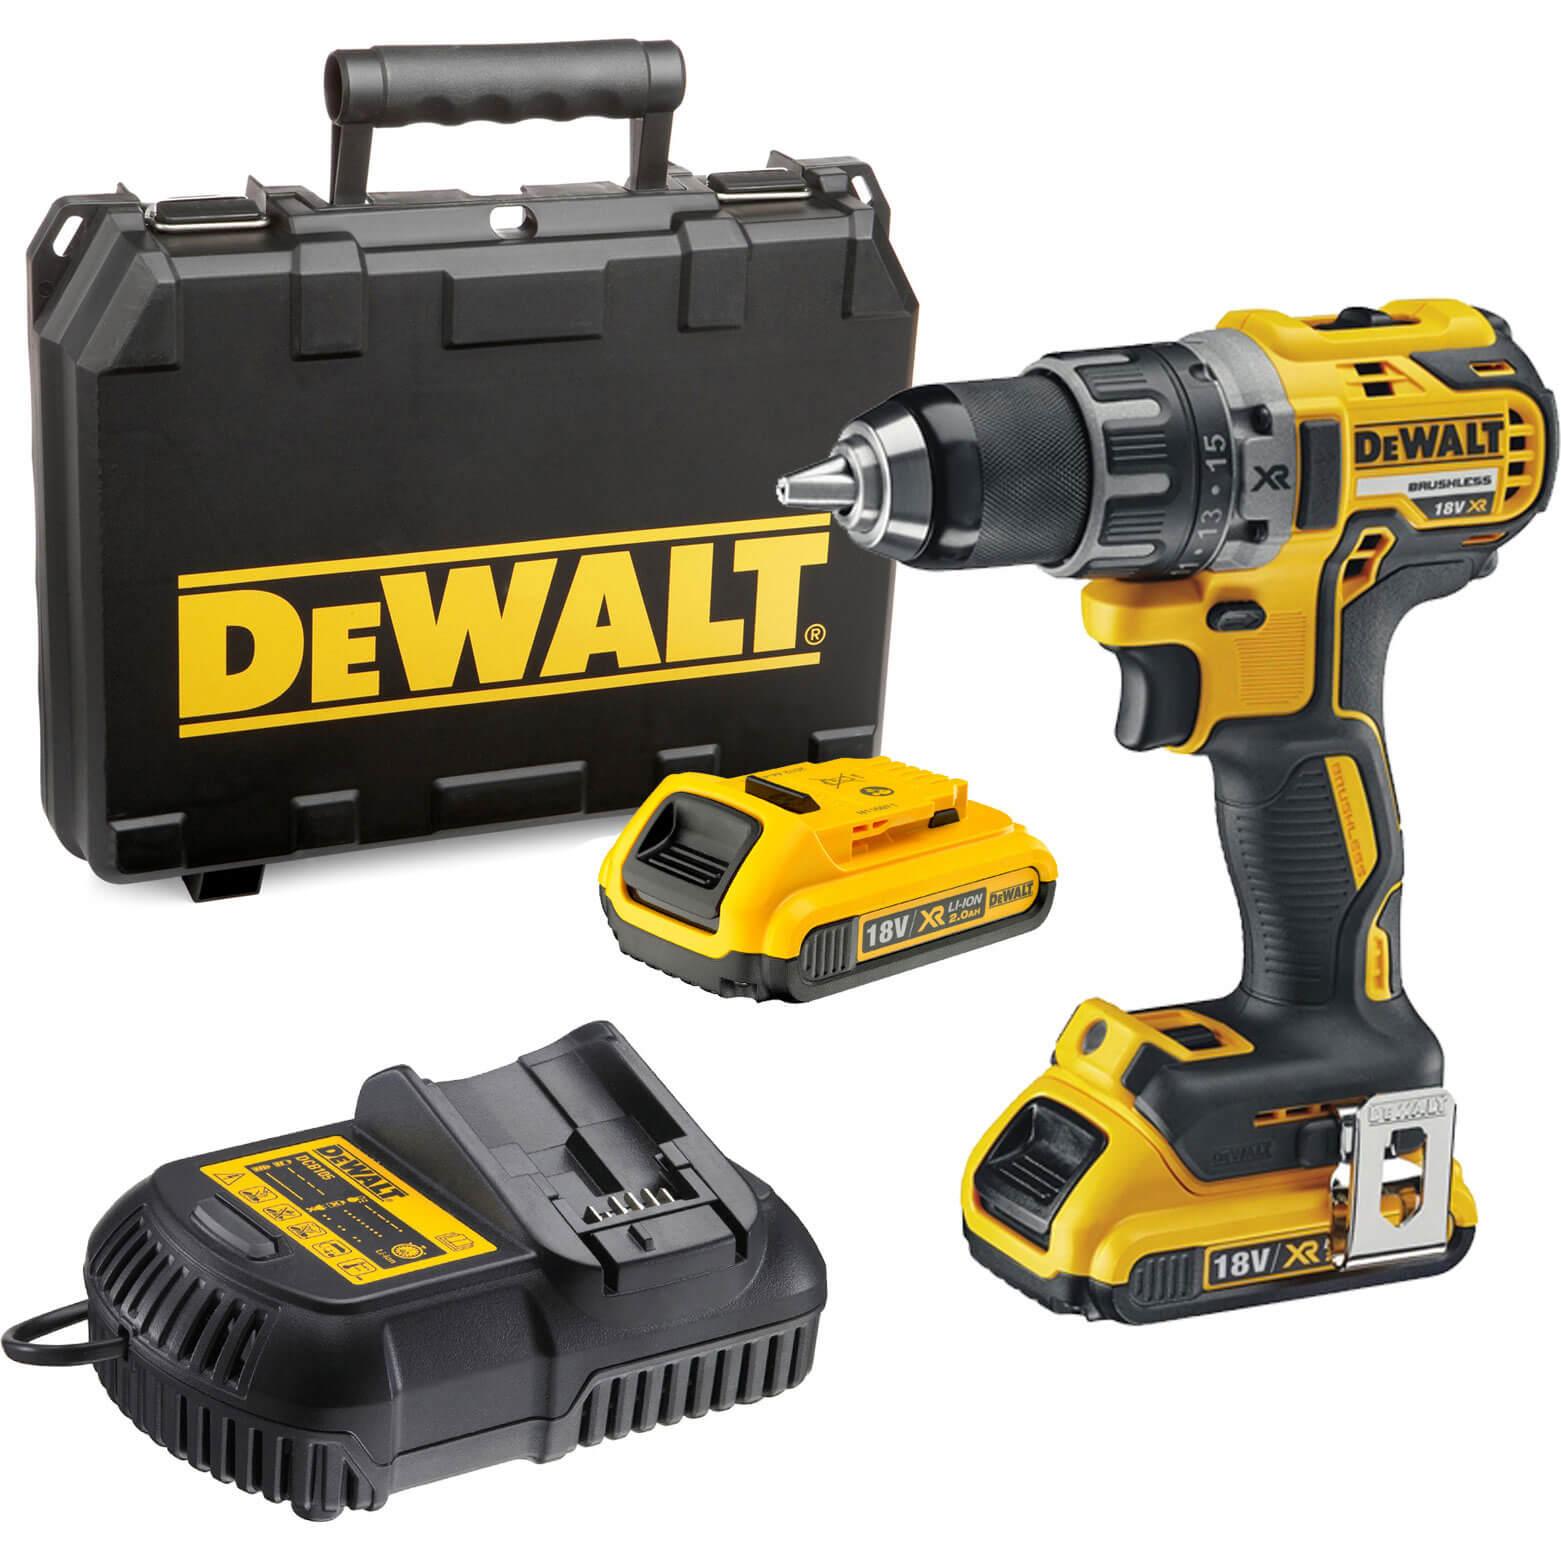 DeWalt DCD791D2 18v Cordless XR Brushless Drill Driver with 2 Liion Batteries 2ah